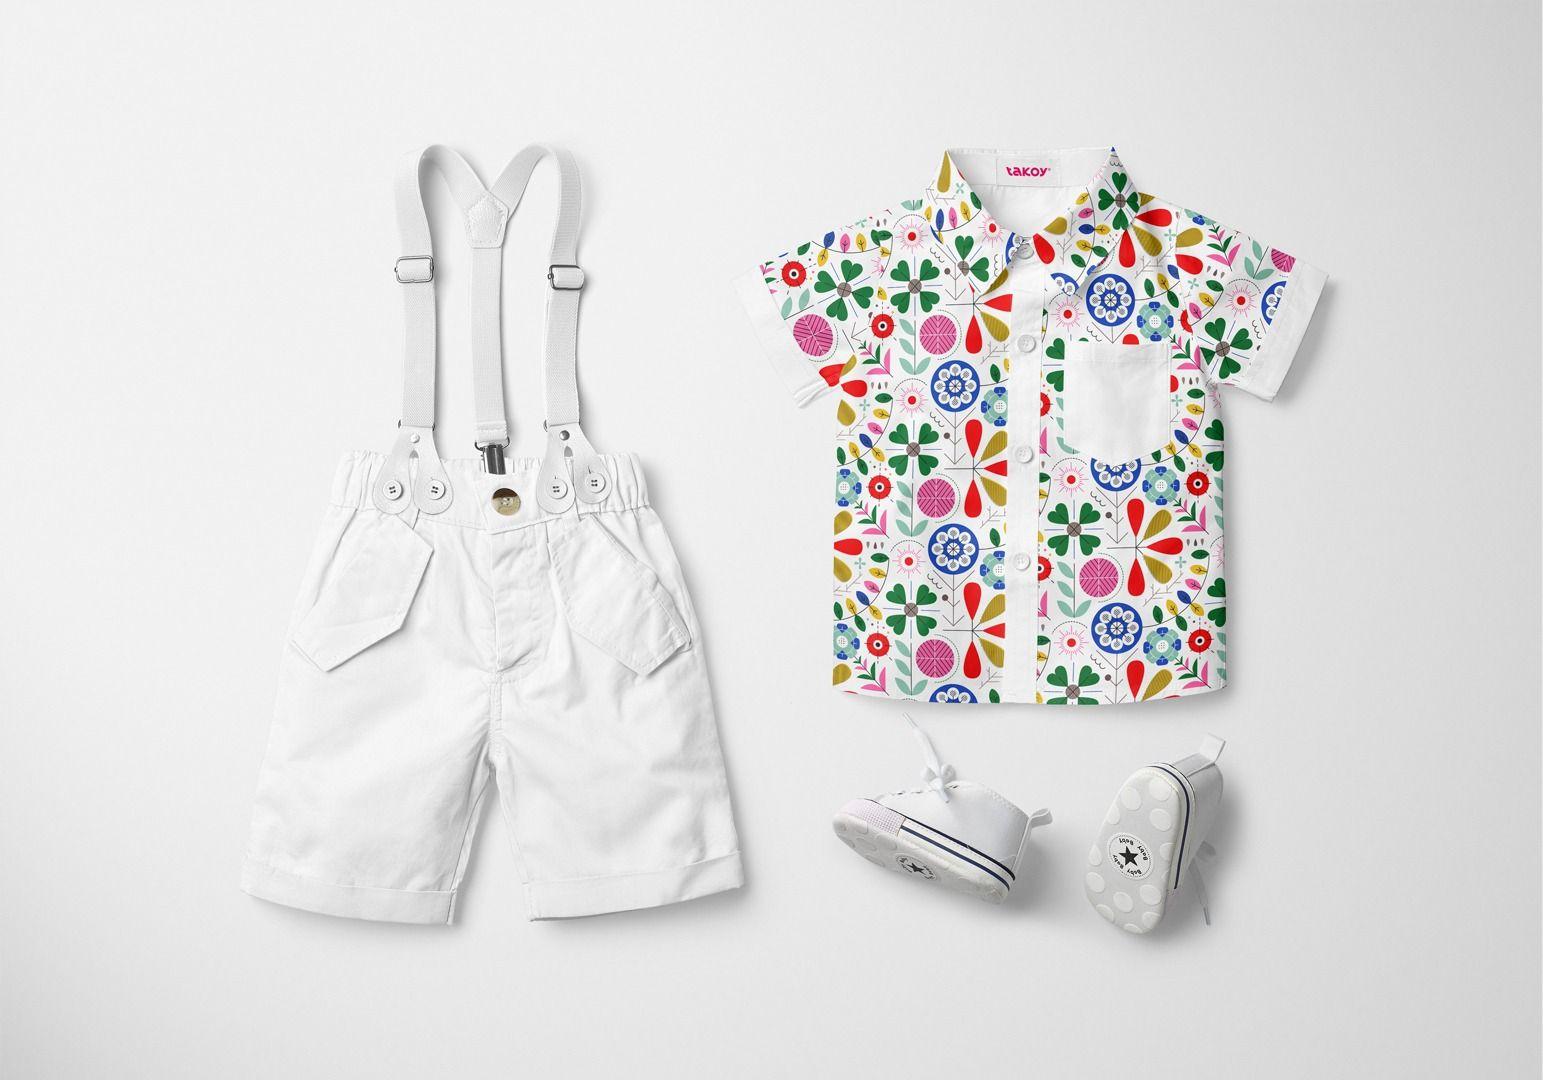 tessuto-di-cotone-premium-motivo-geometrico-folk-bianco